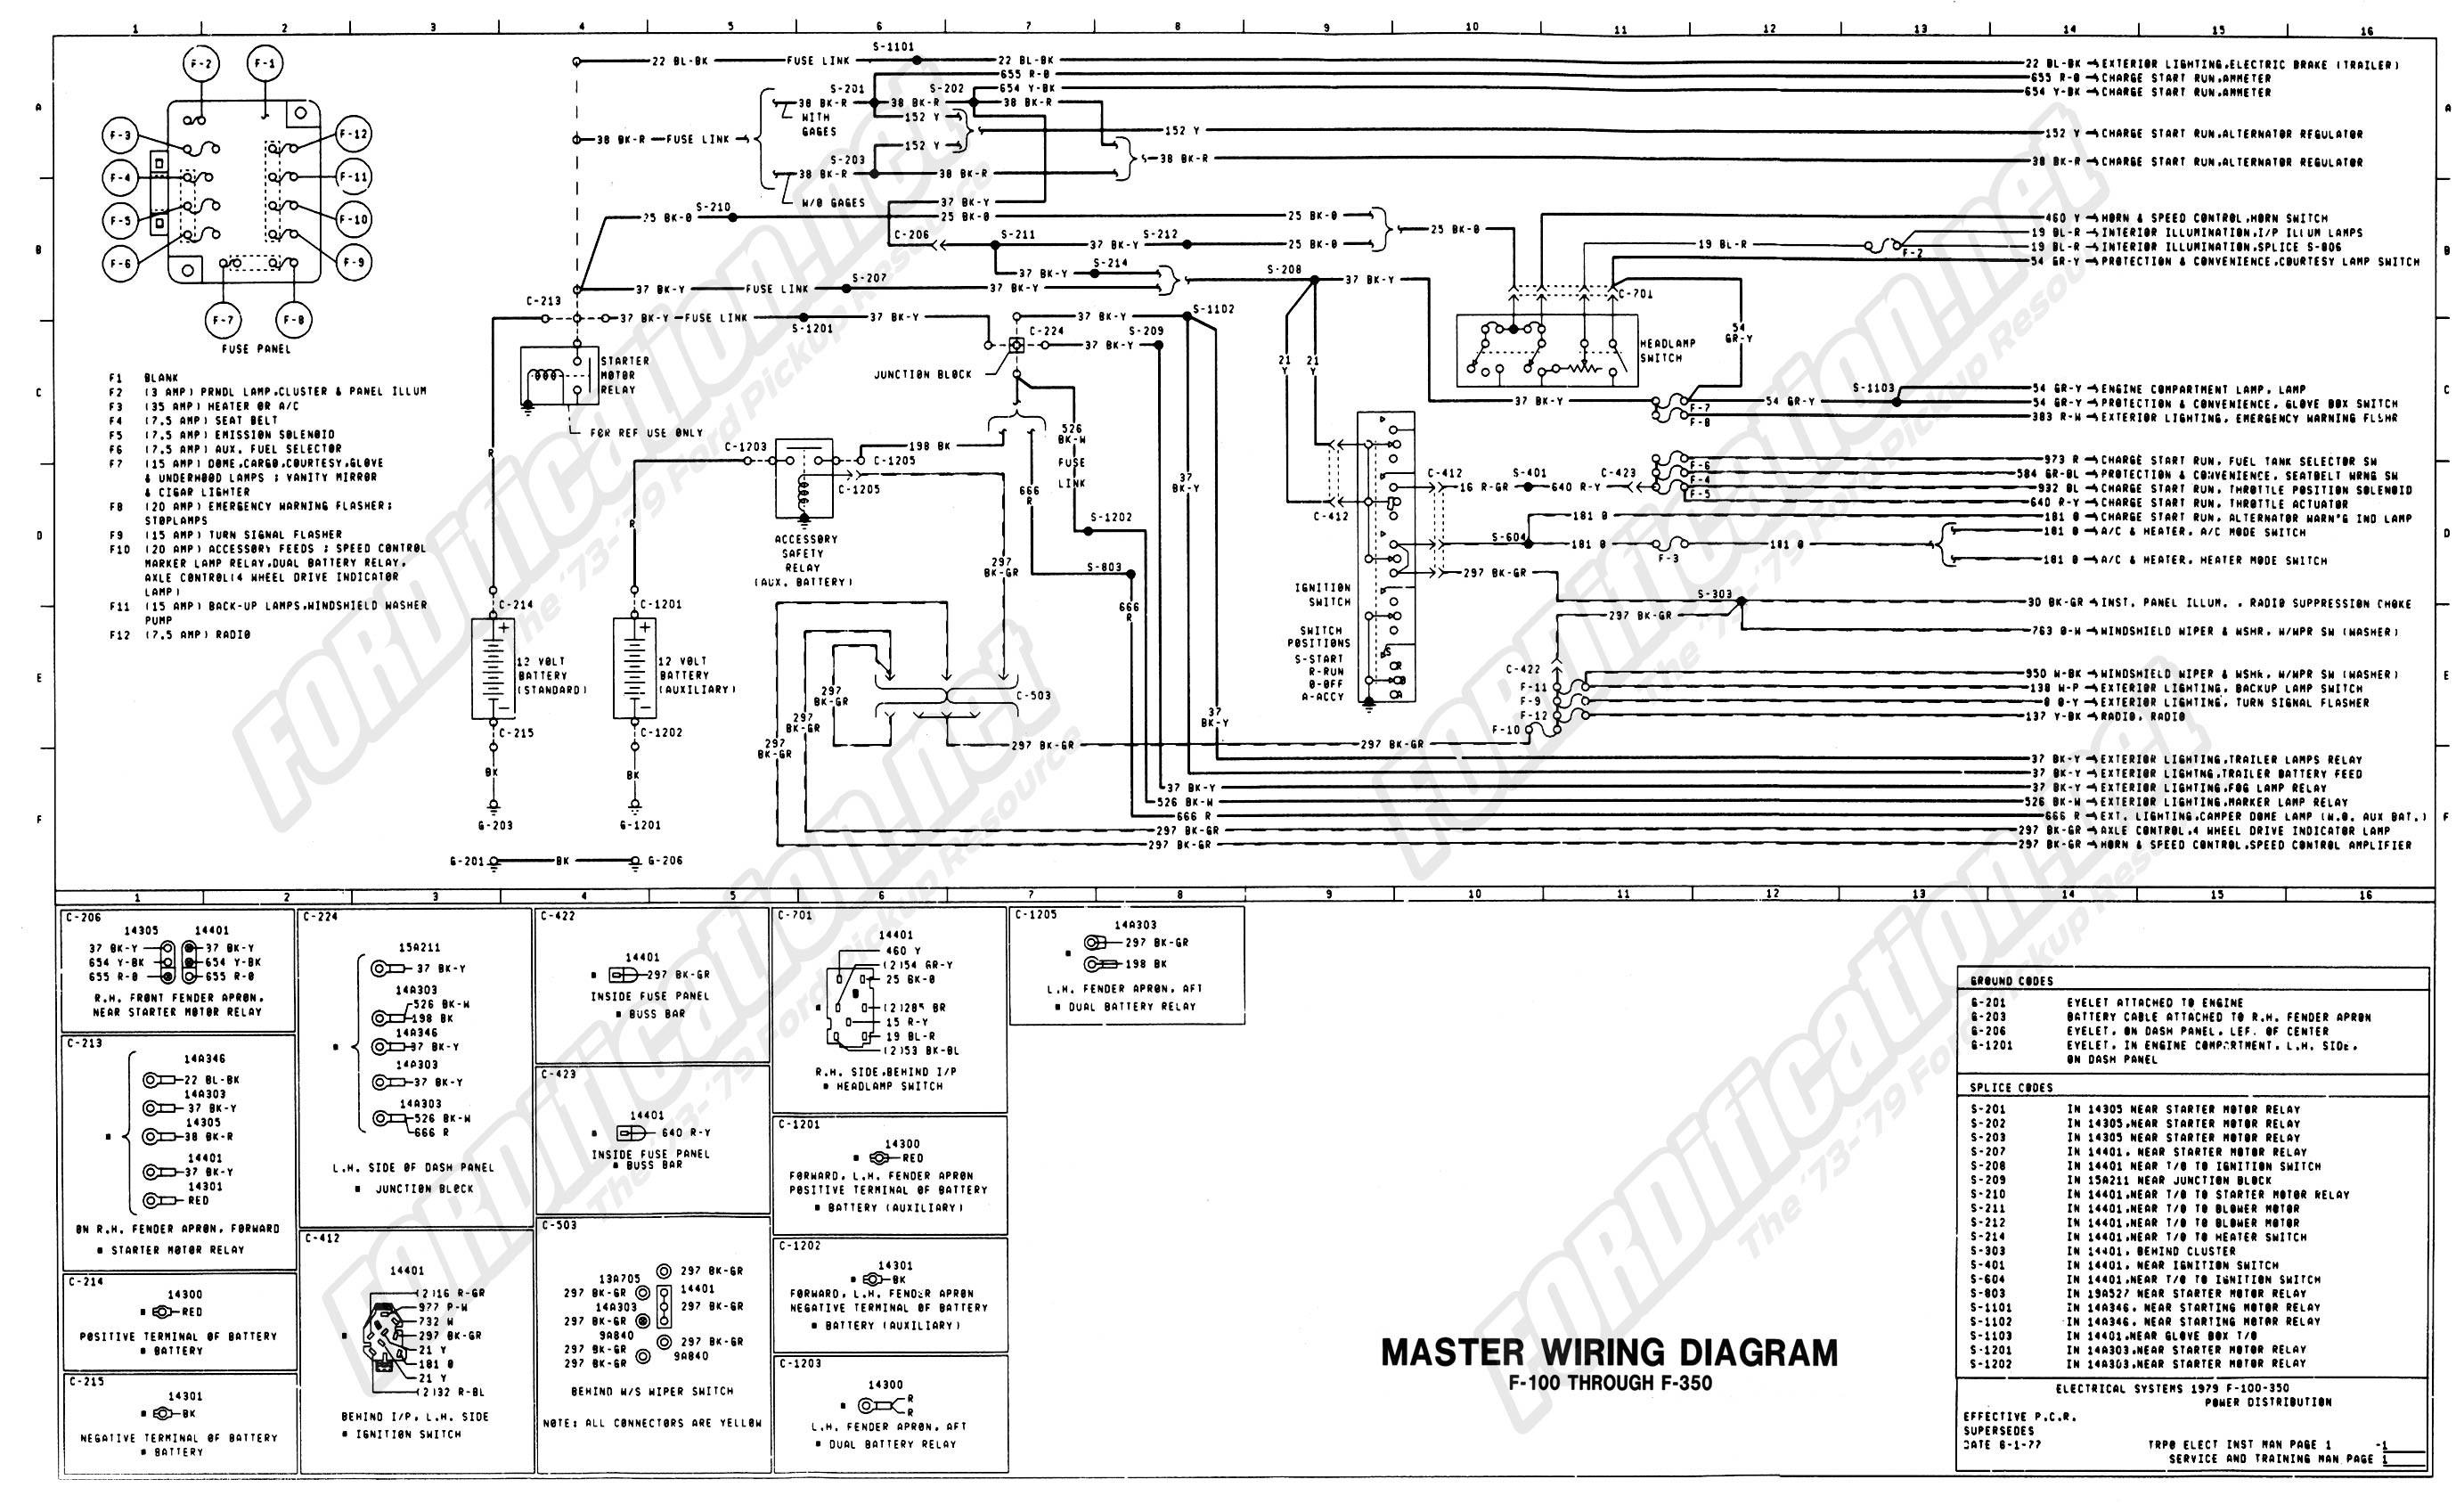 Mitchell Wiring Diagrams Free Mitchell Wiring Diagrams Mitchell - Mitchell on demand wiring diagram